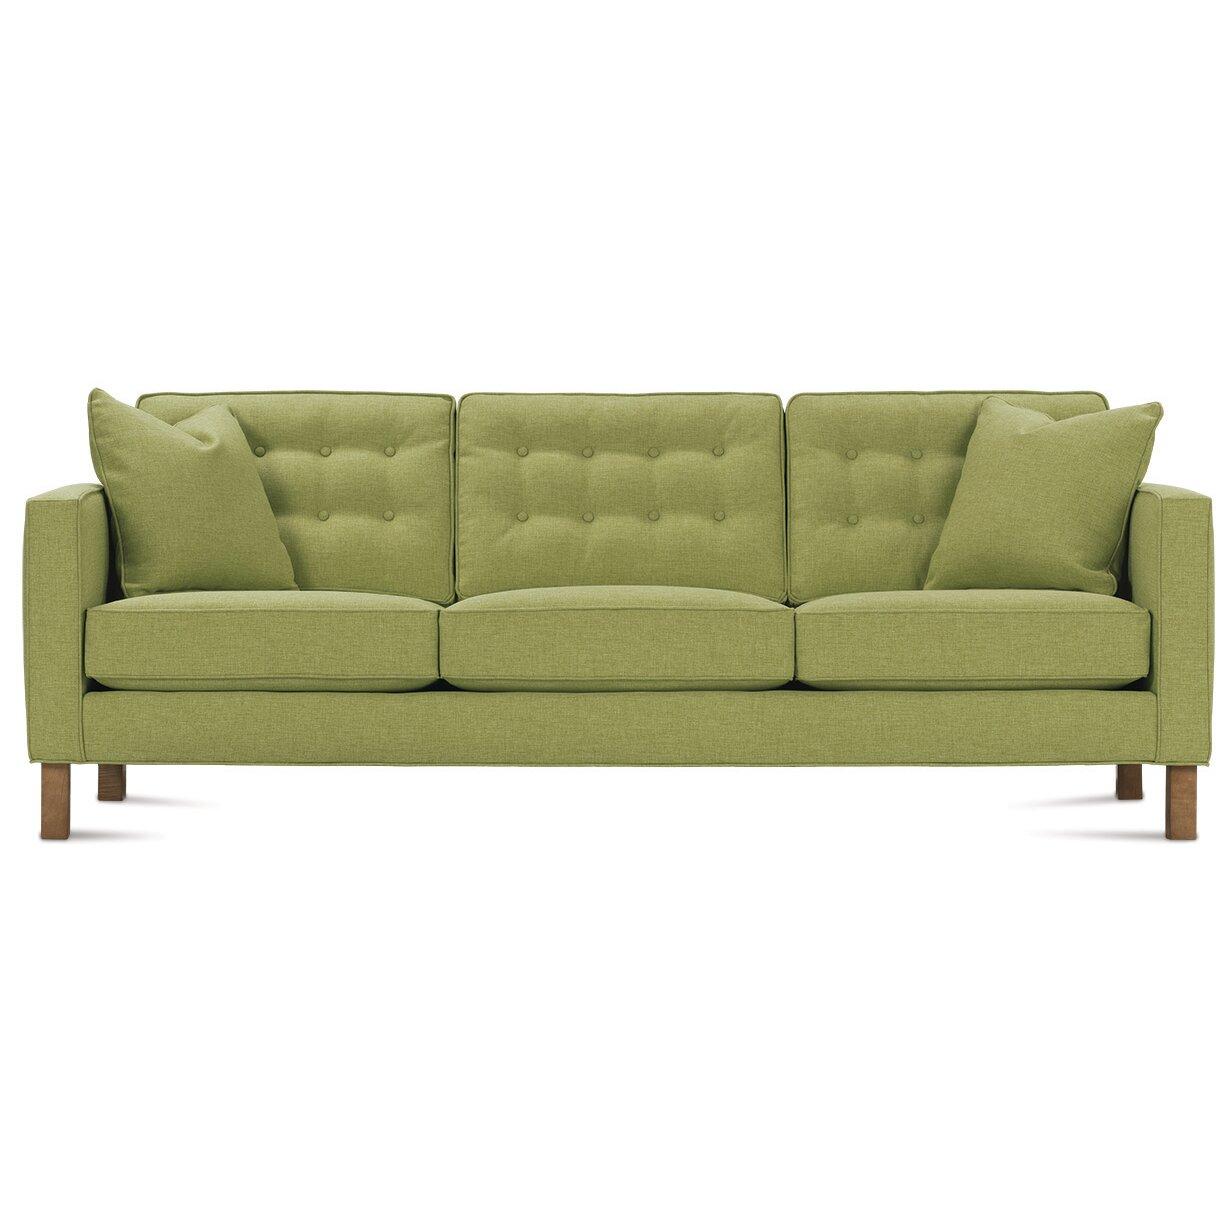 abbott sofa reviews allmodern. Black Bedroom Furniture Sets. Home Design Ideas